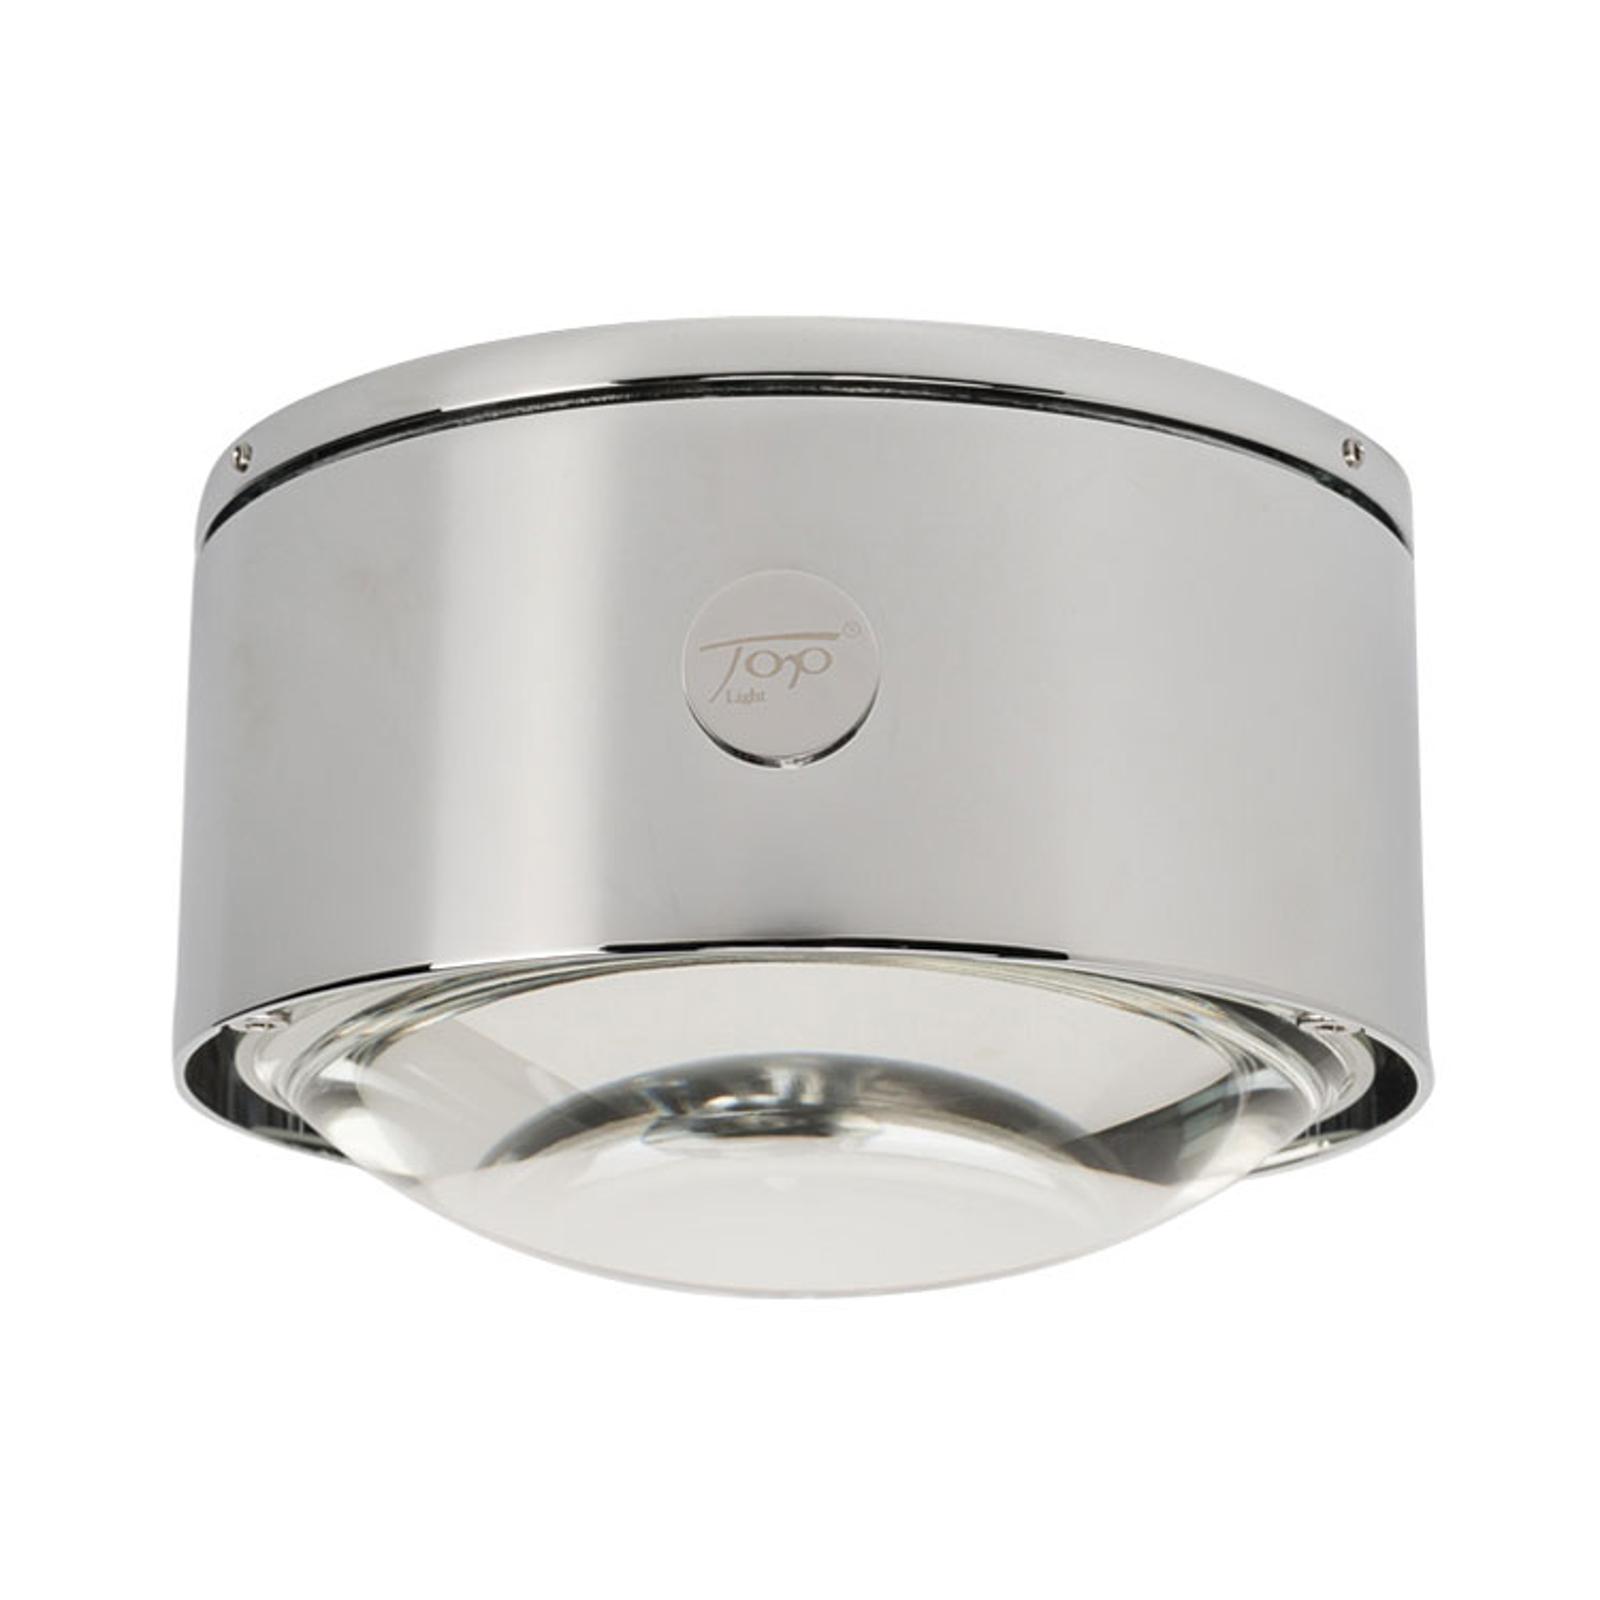 Lampa sufitowa LED Puk Maxx One 2 , chrom matowy